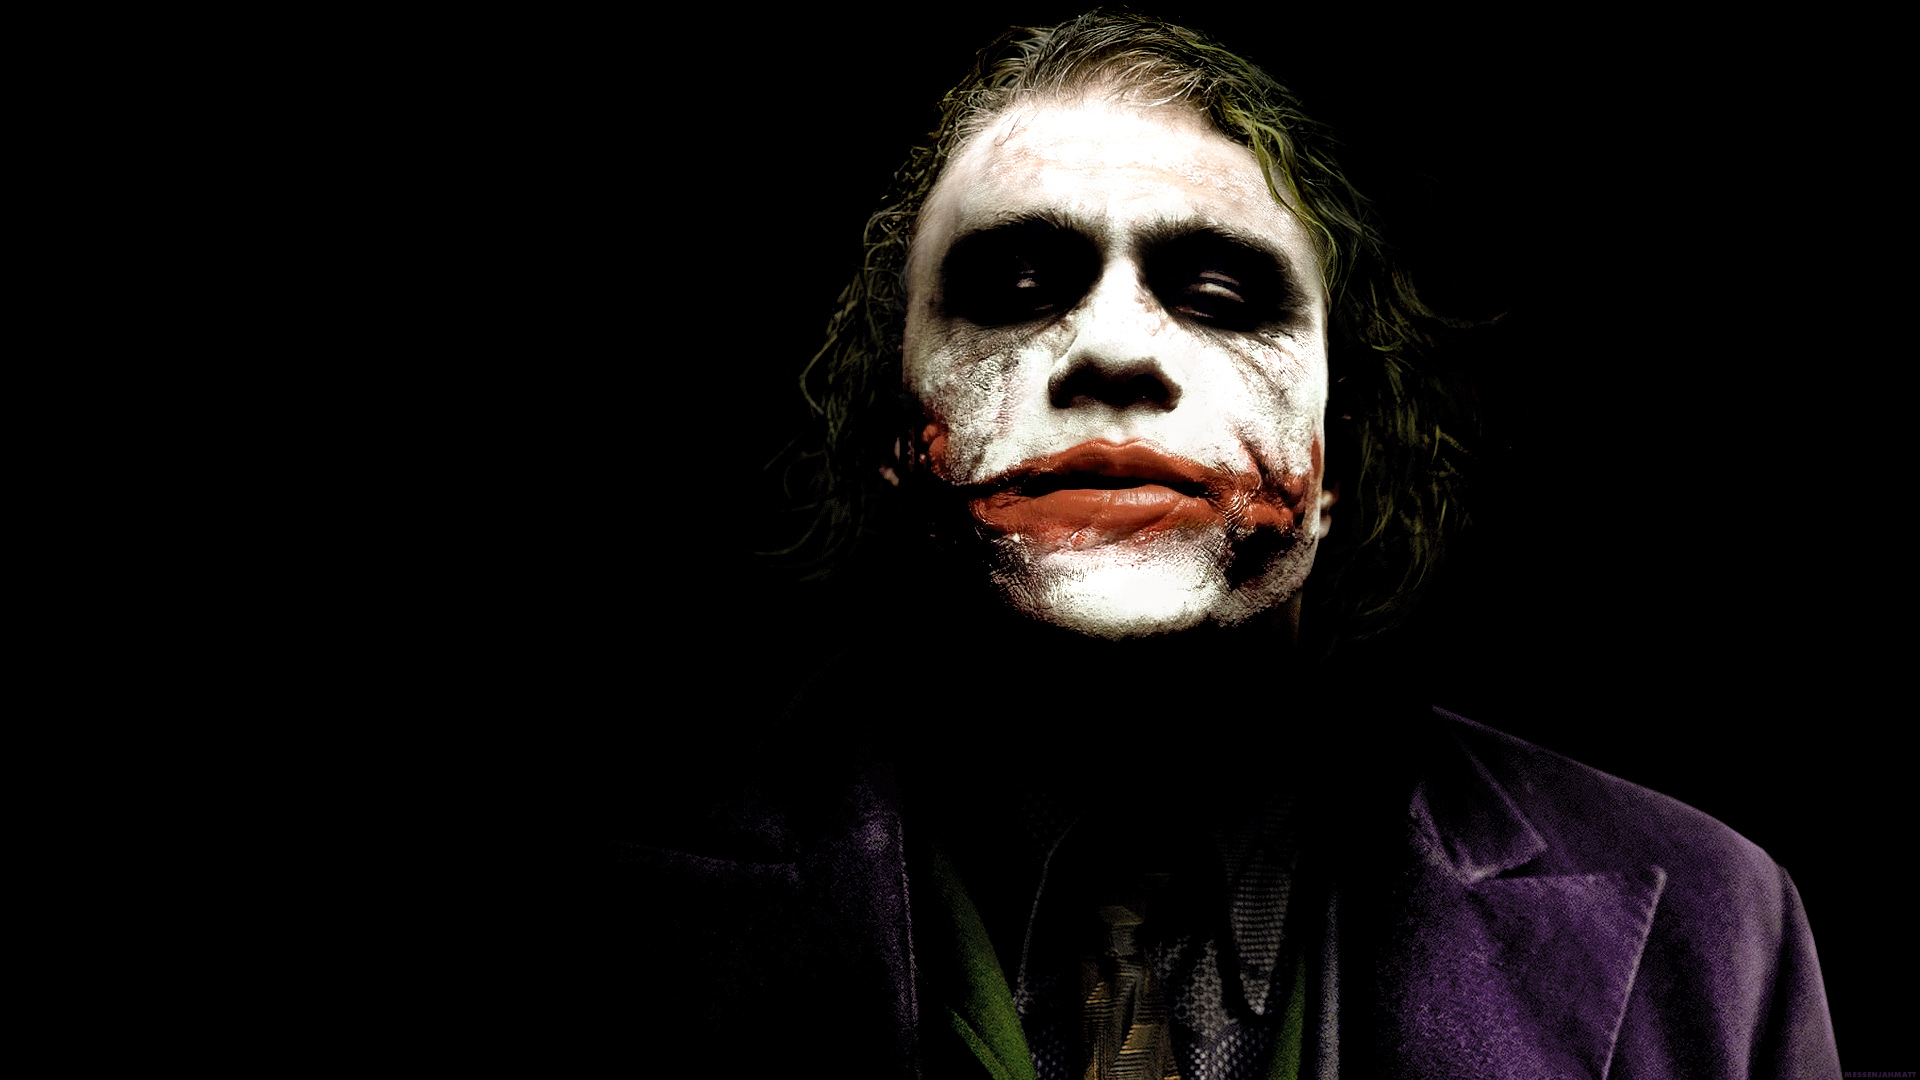 heath ledger joker - photo #28